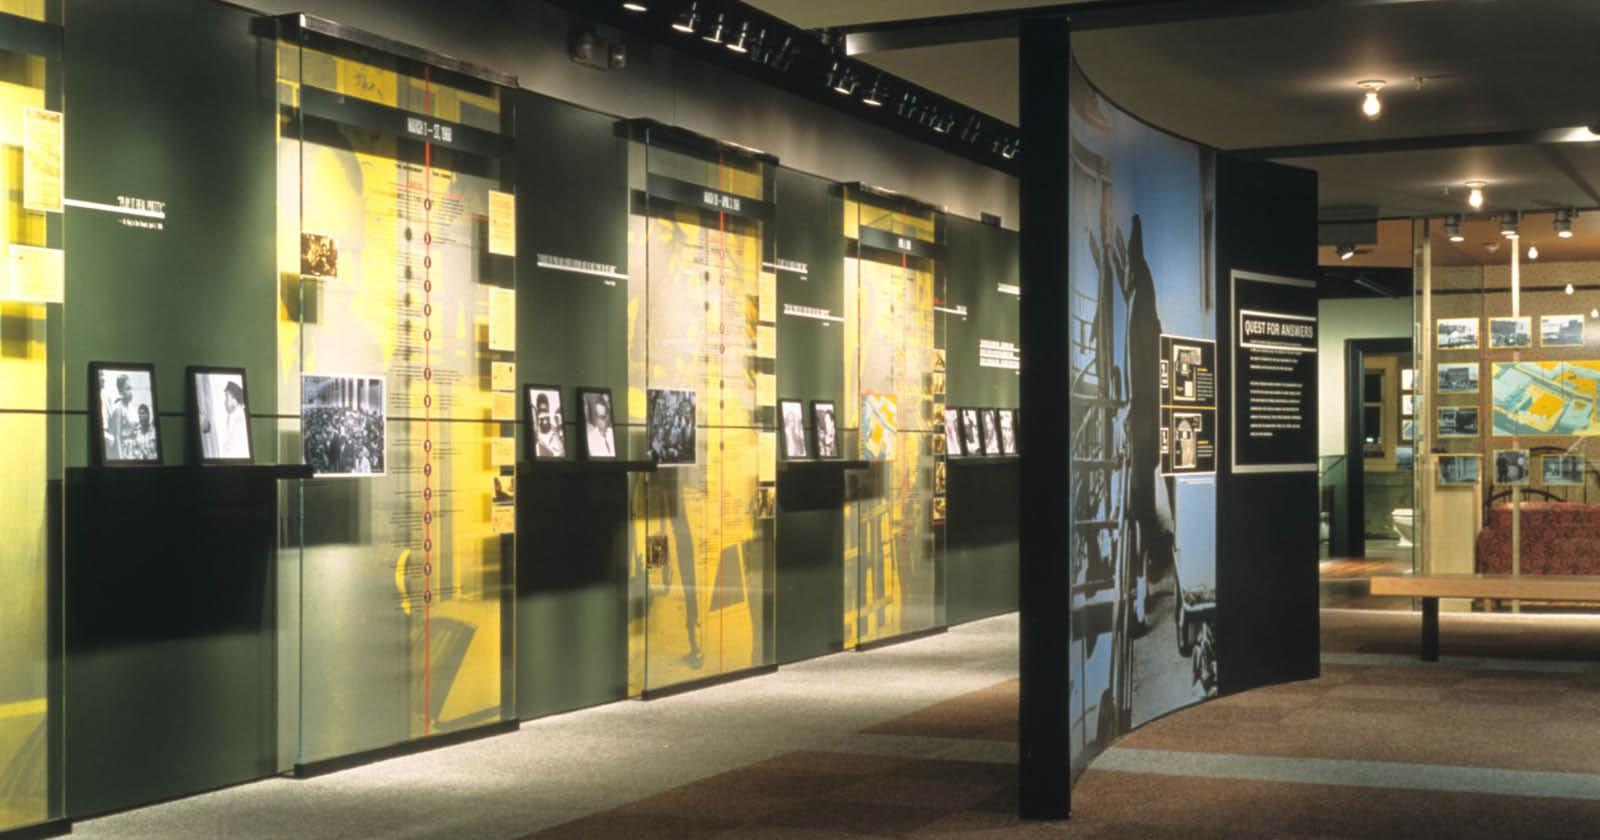 National Civil Rights Museum Expansion, Memphis, TN